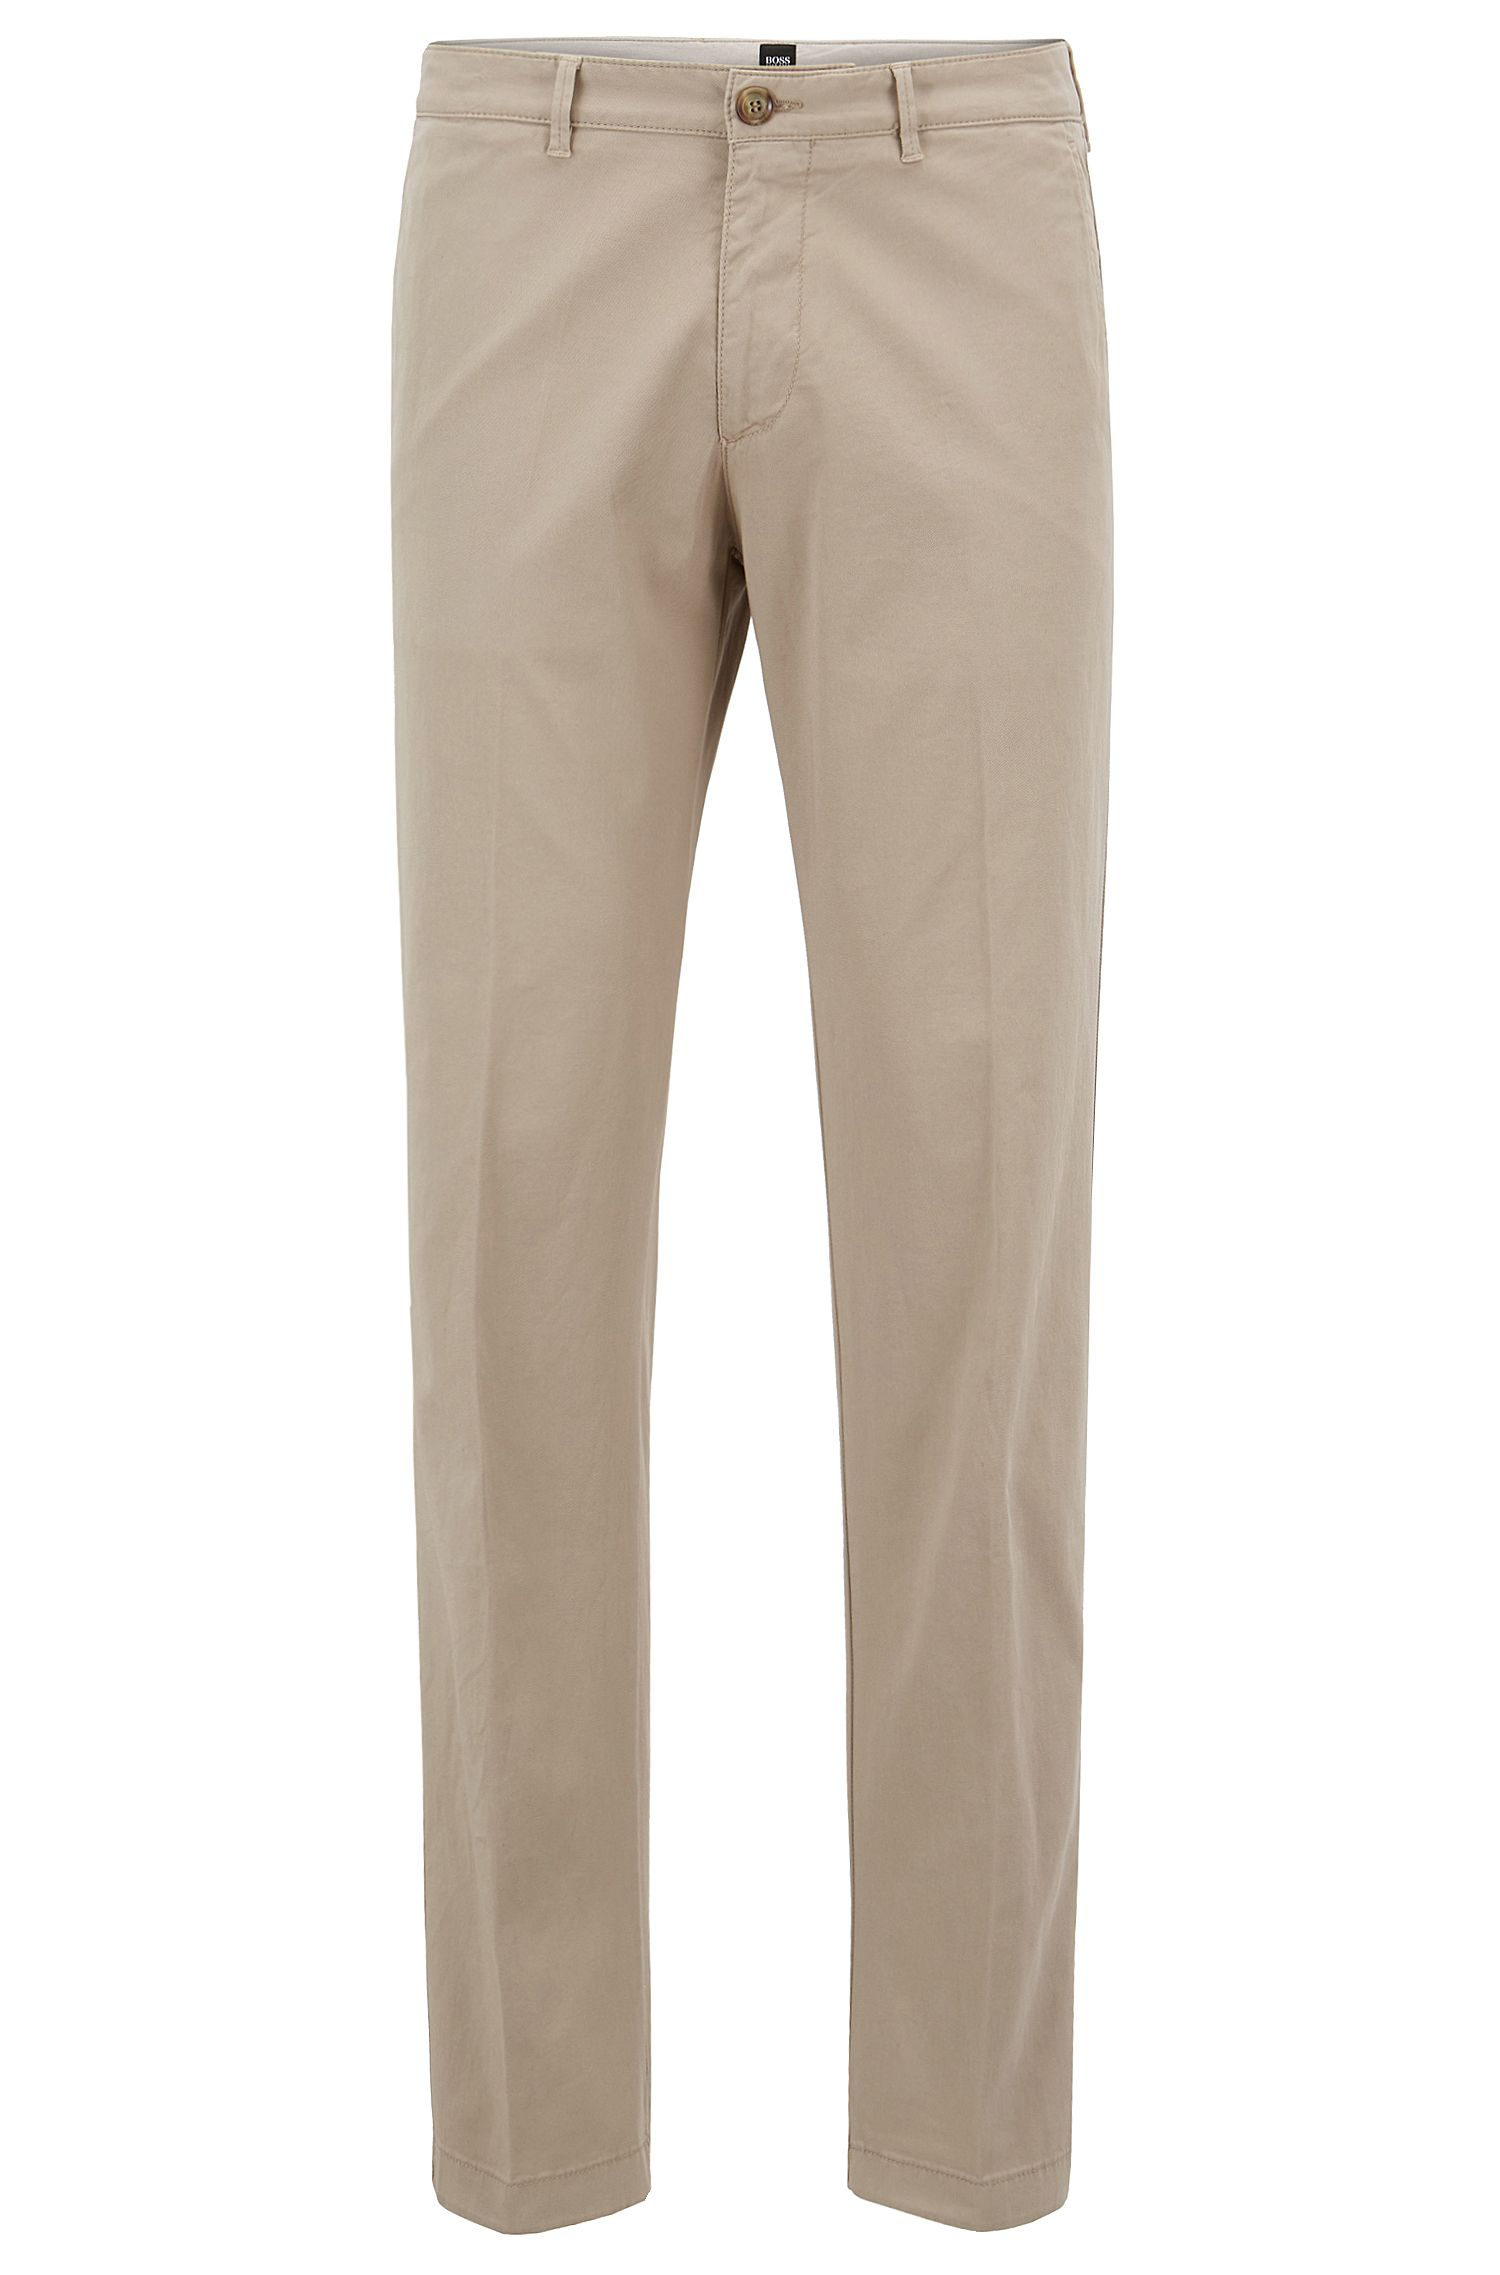 Chino BOSS Homme Regular Fit en gabardine de coton stretch